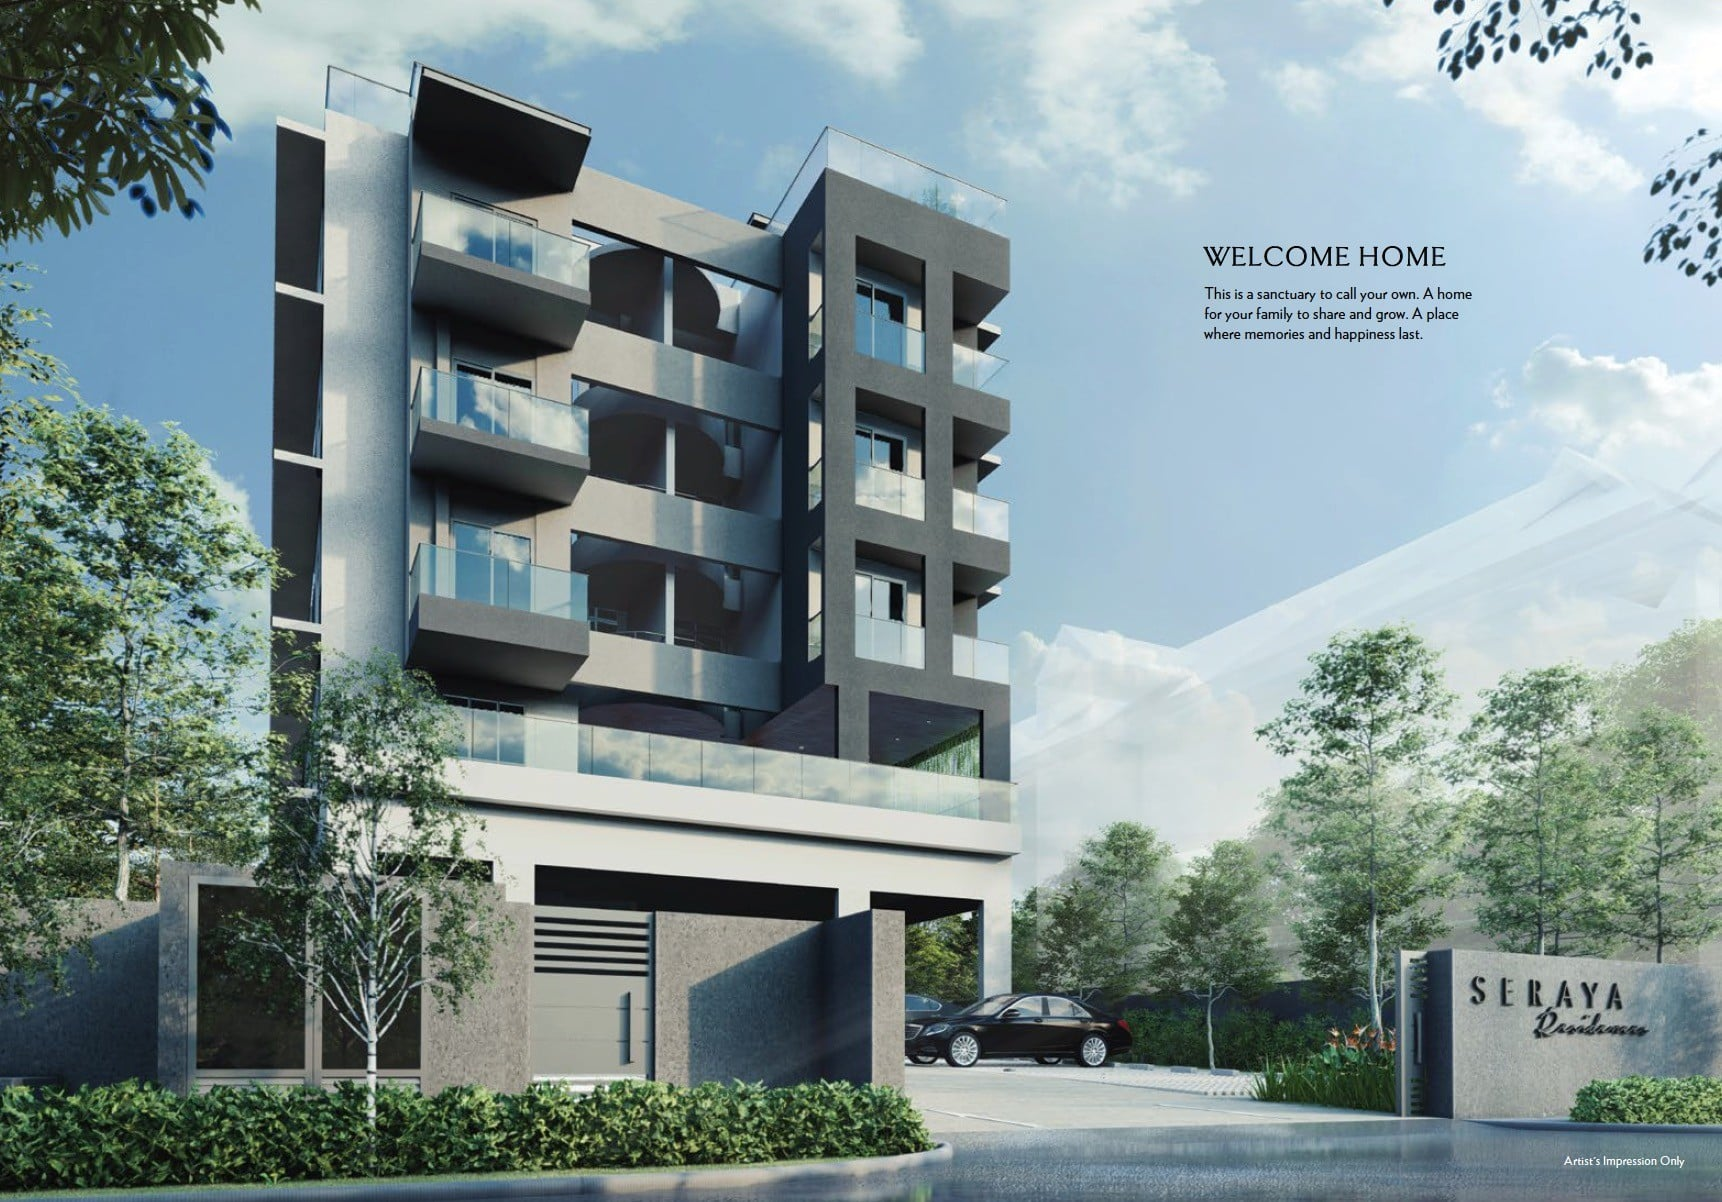 Seraya-Residences-Entrance Main